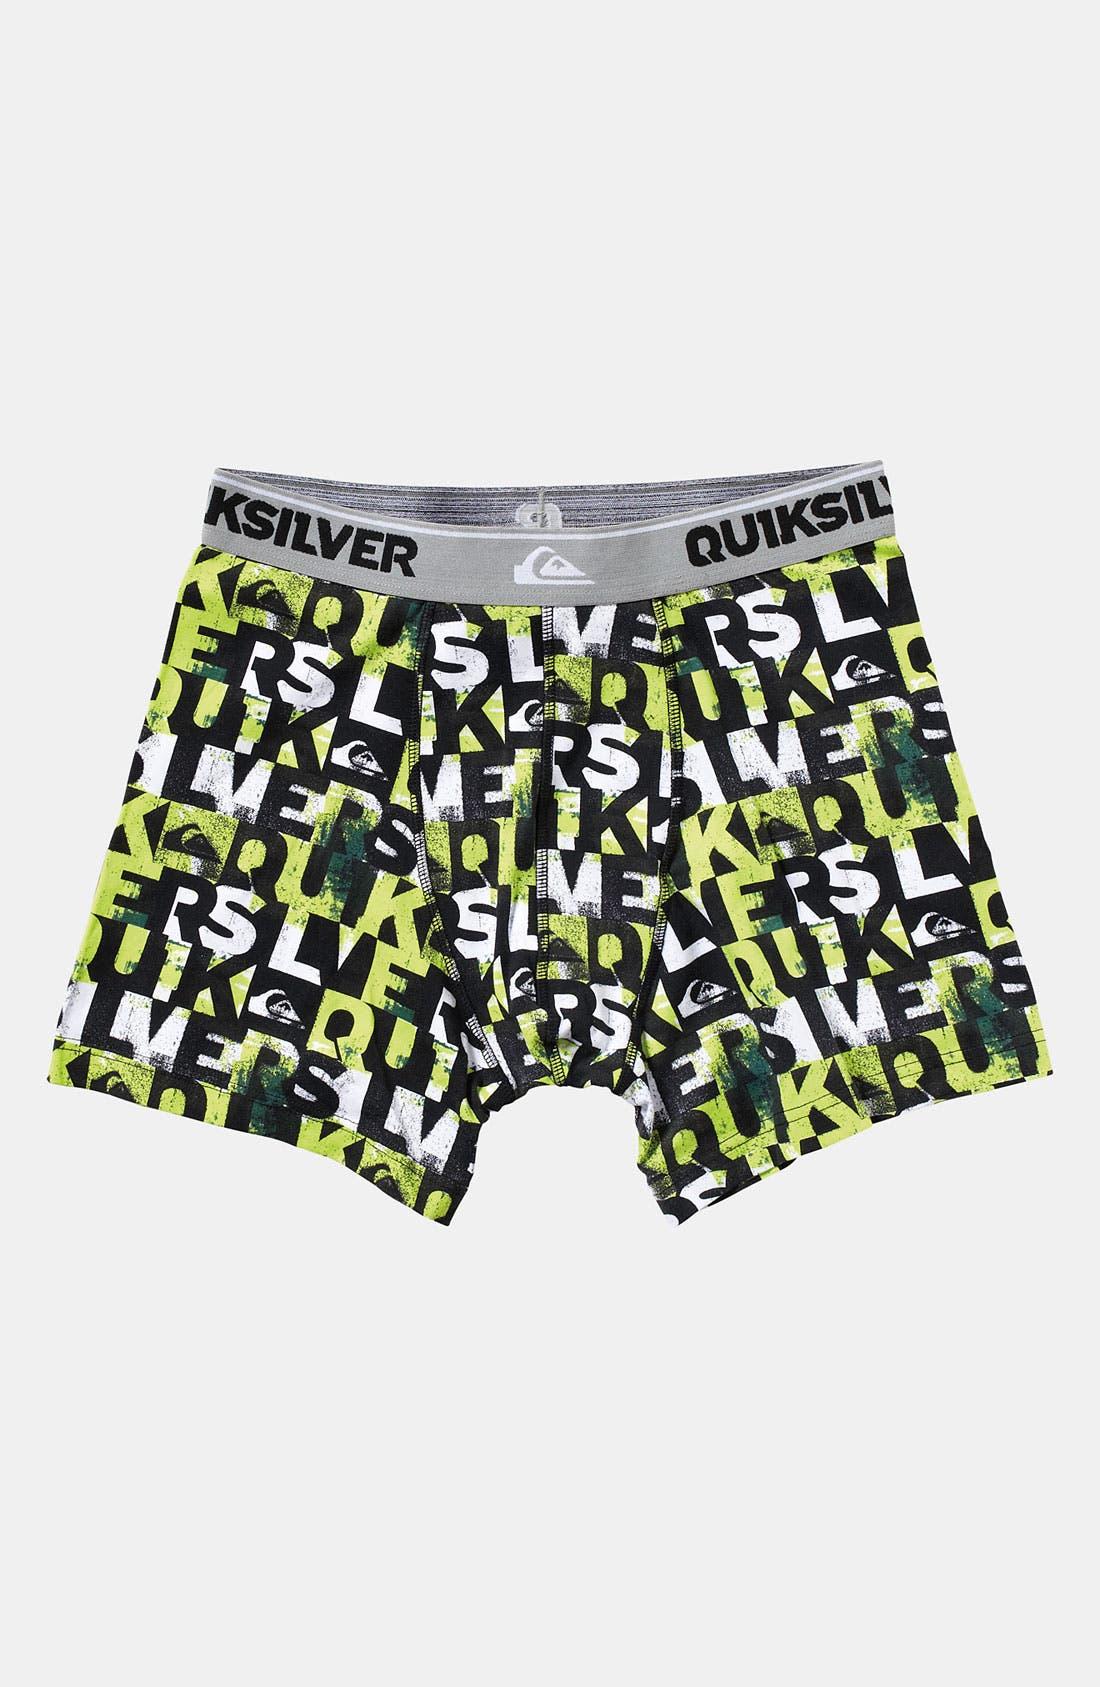 Alternate Image 1 Selected - Quiksilver 'Coconut' Boxer Briefs (Big Boys)